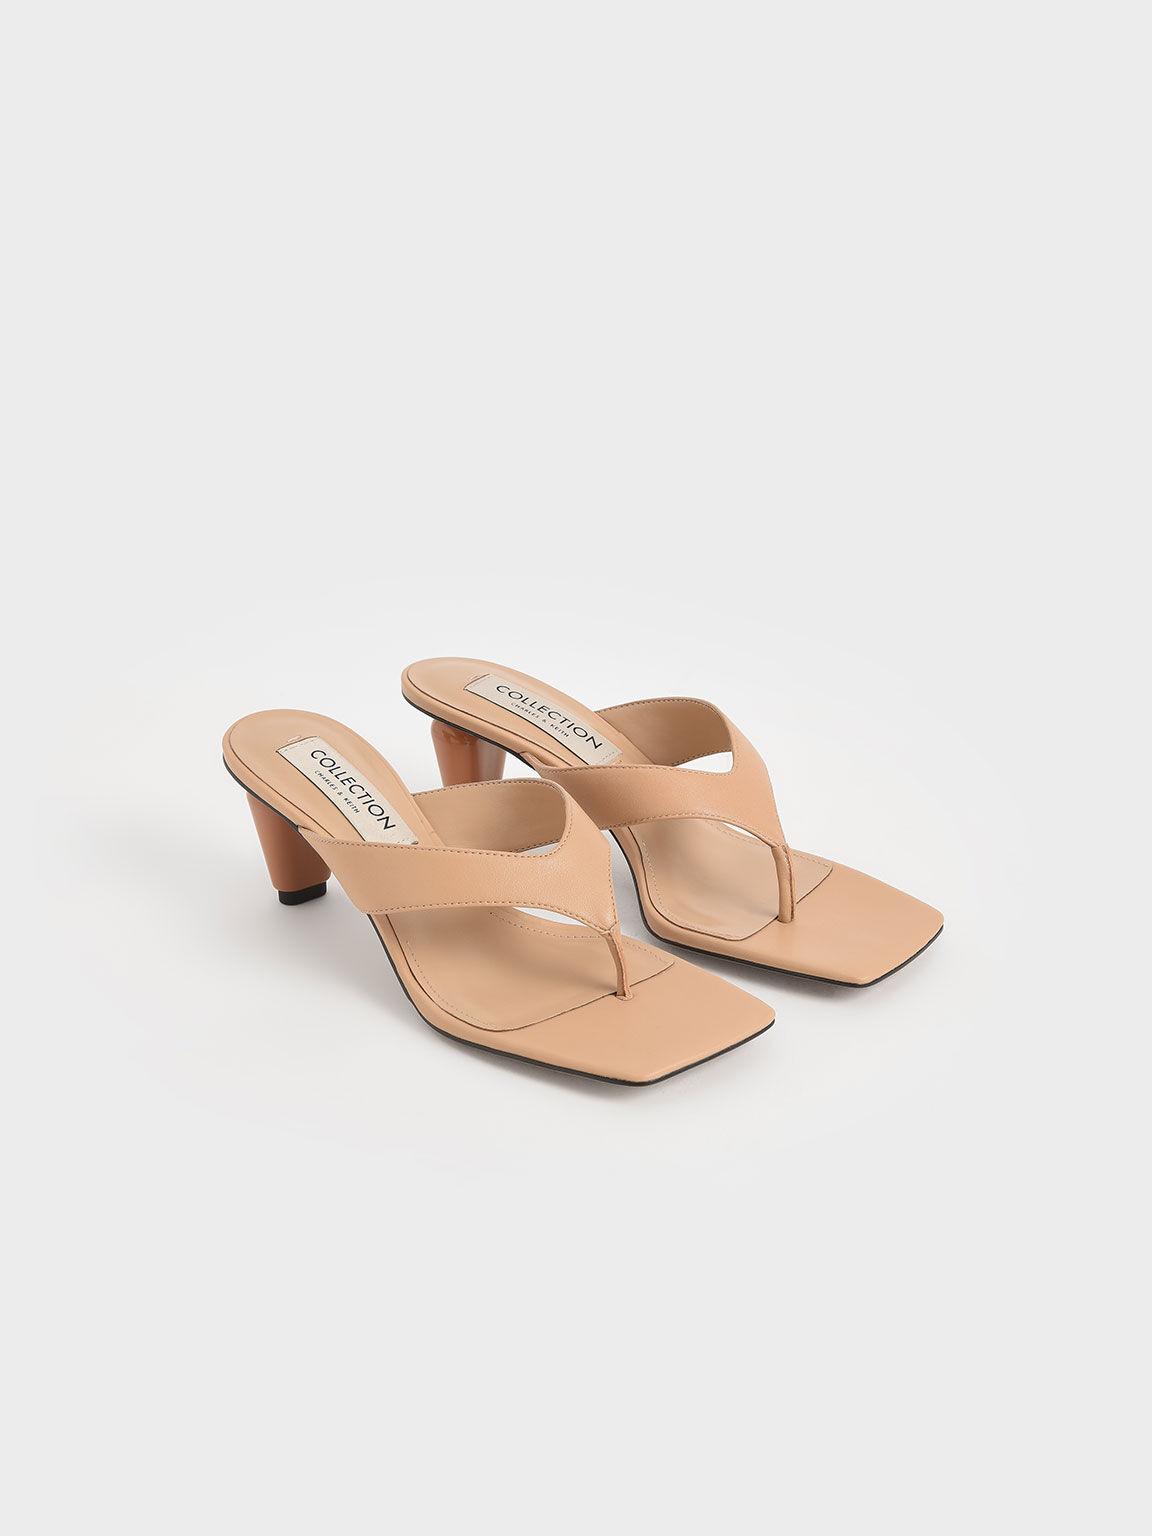 Leather Sculptural Heel Thong Sandals, Nude, hi-res